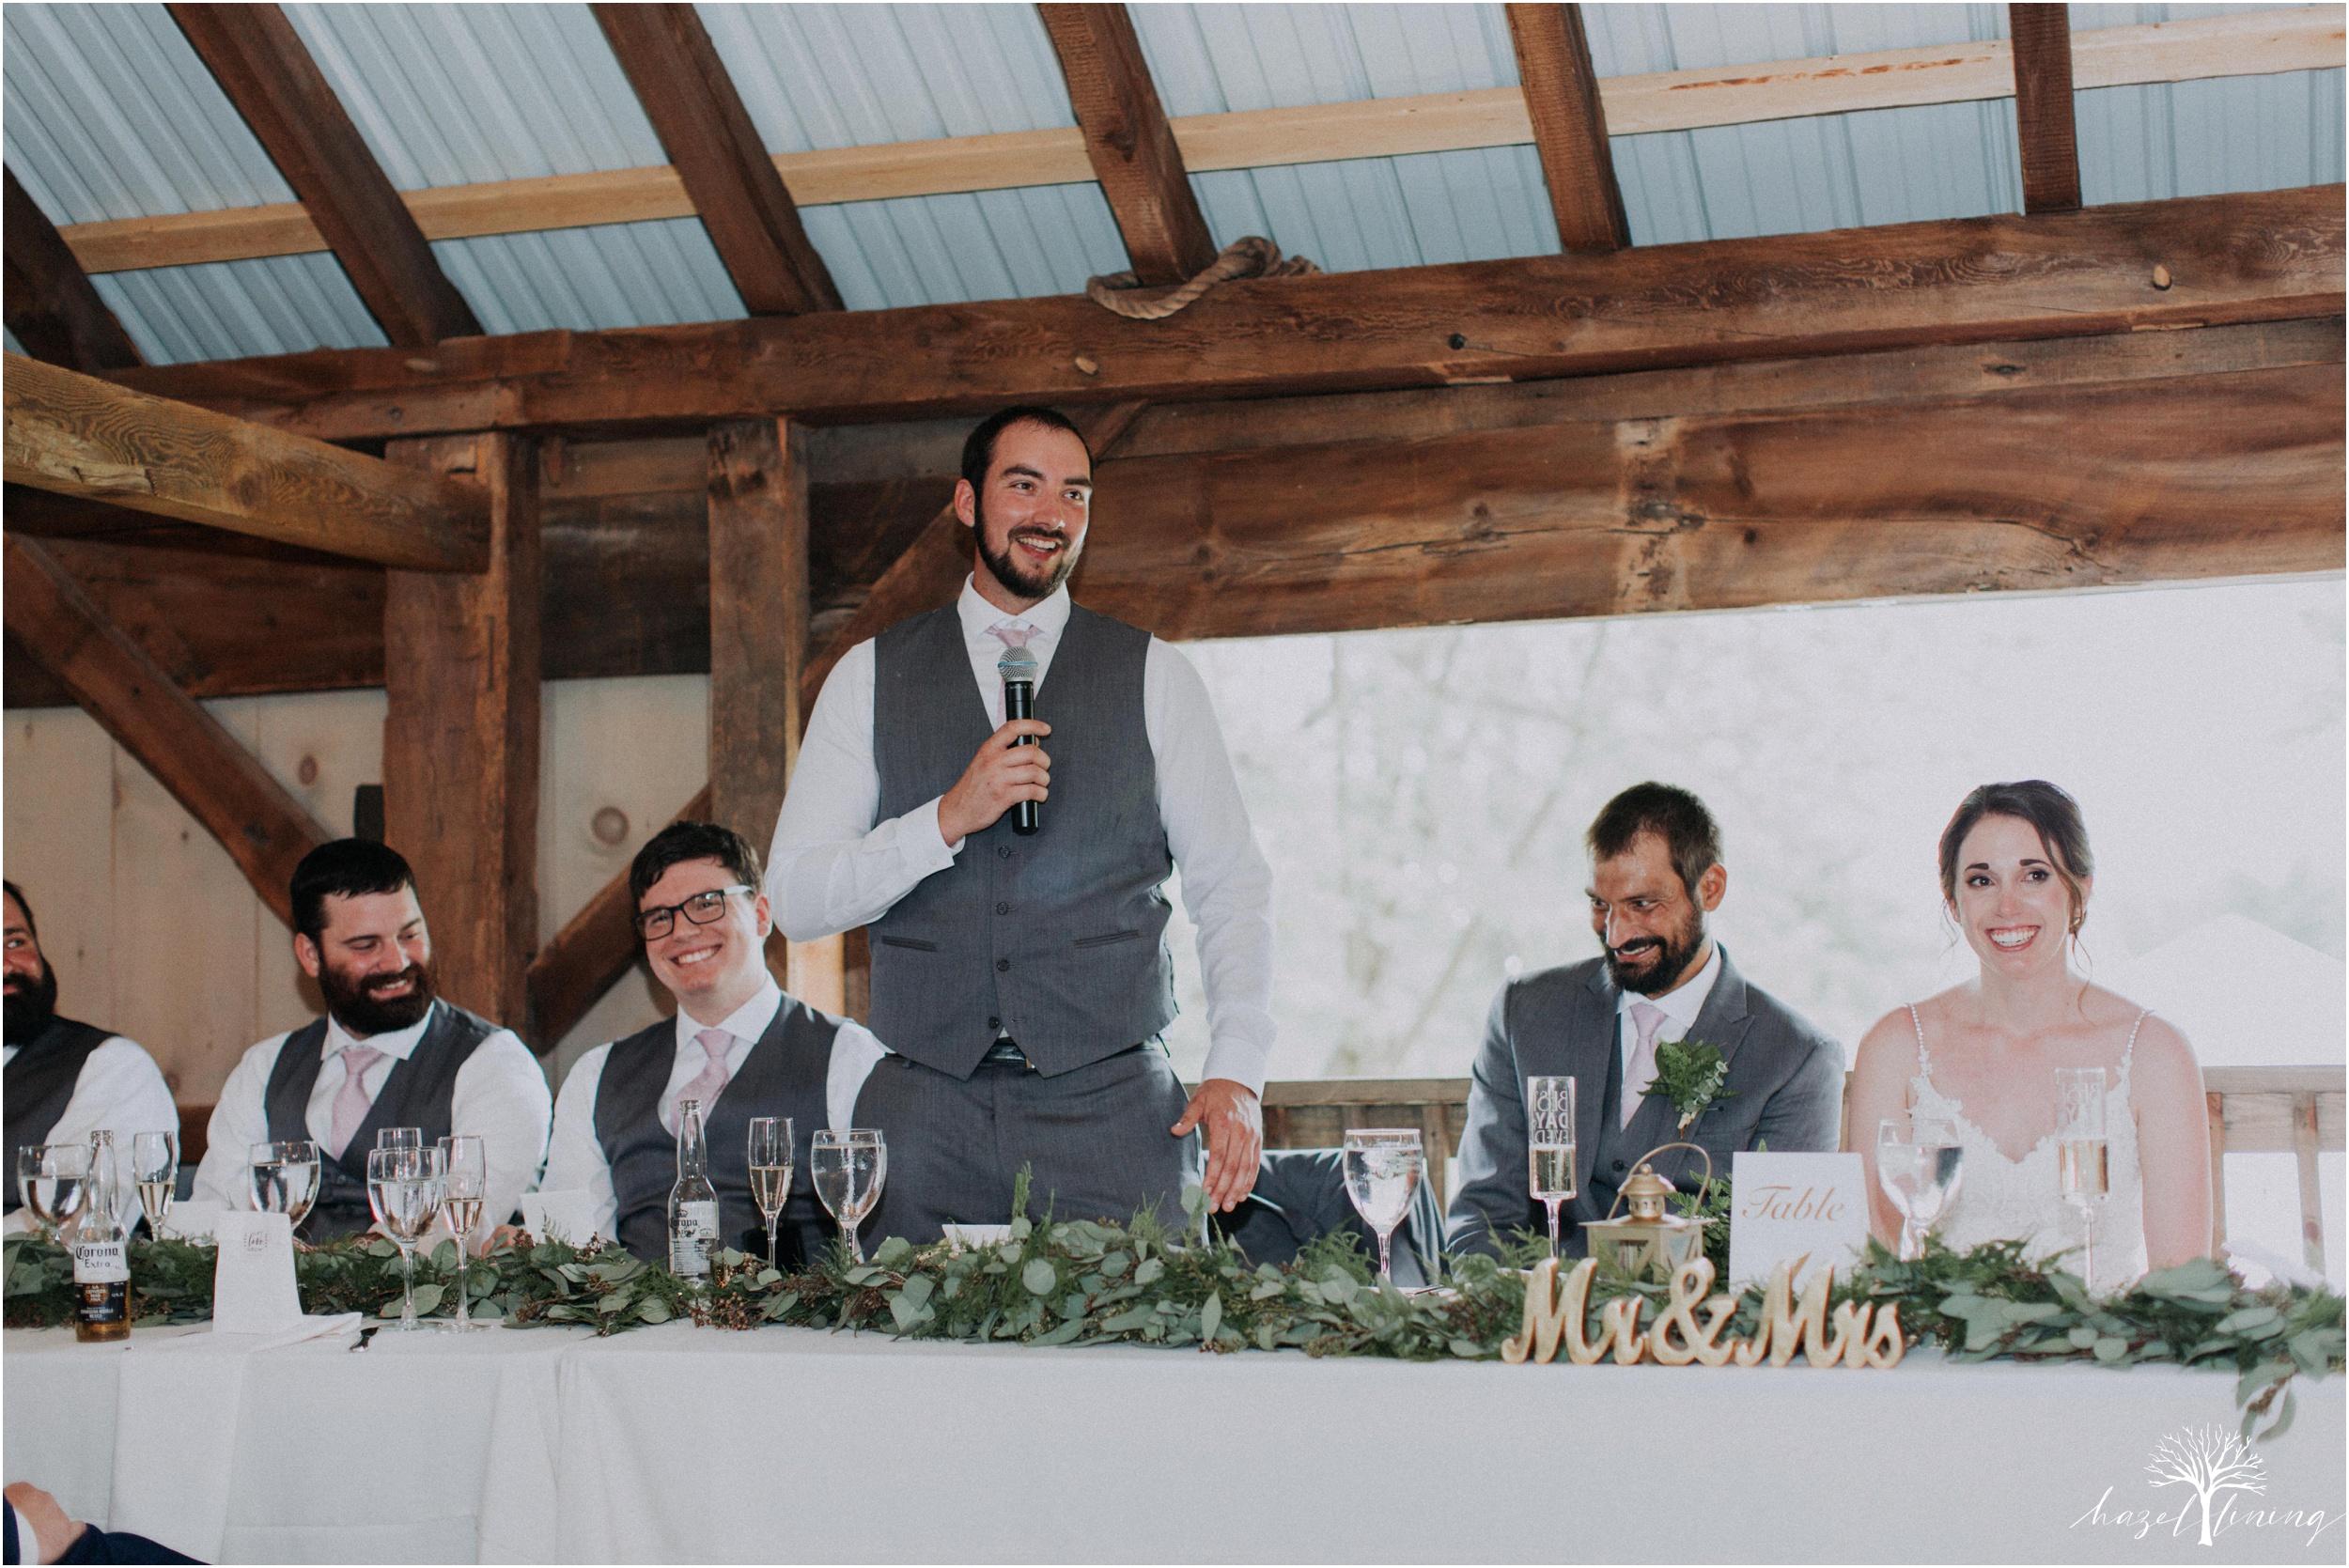 hazel-lining-travel-wedding-elopement-photography-lisa-landon-shoemaker-the-farm-bakery-and-events-bucks-county-quakertown-pennsylvania-summer-country-outdoor-farm-wedding_0126.jpg